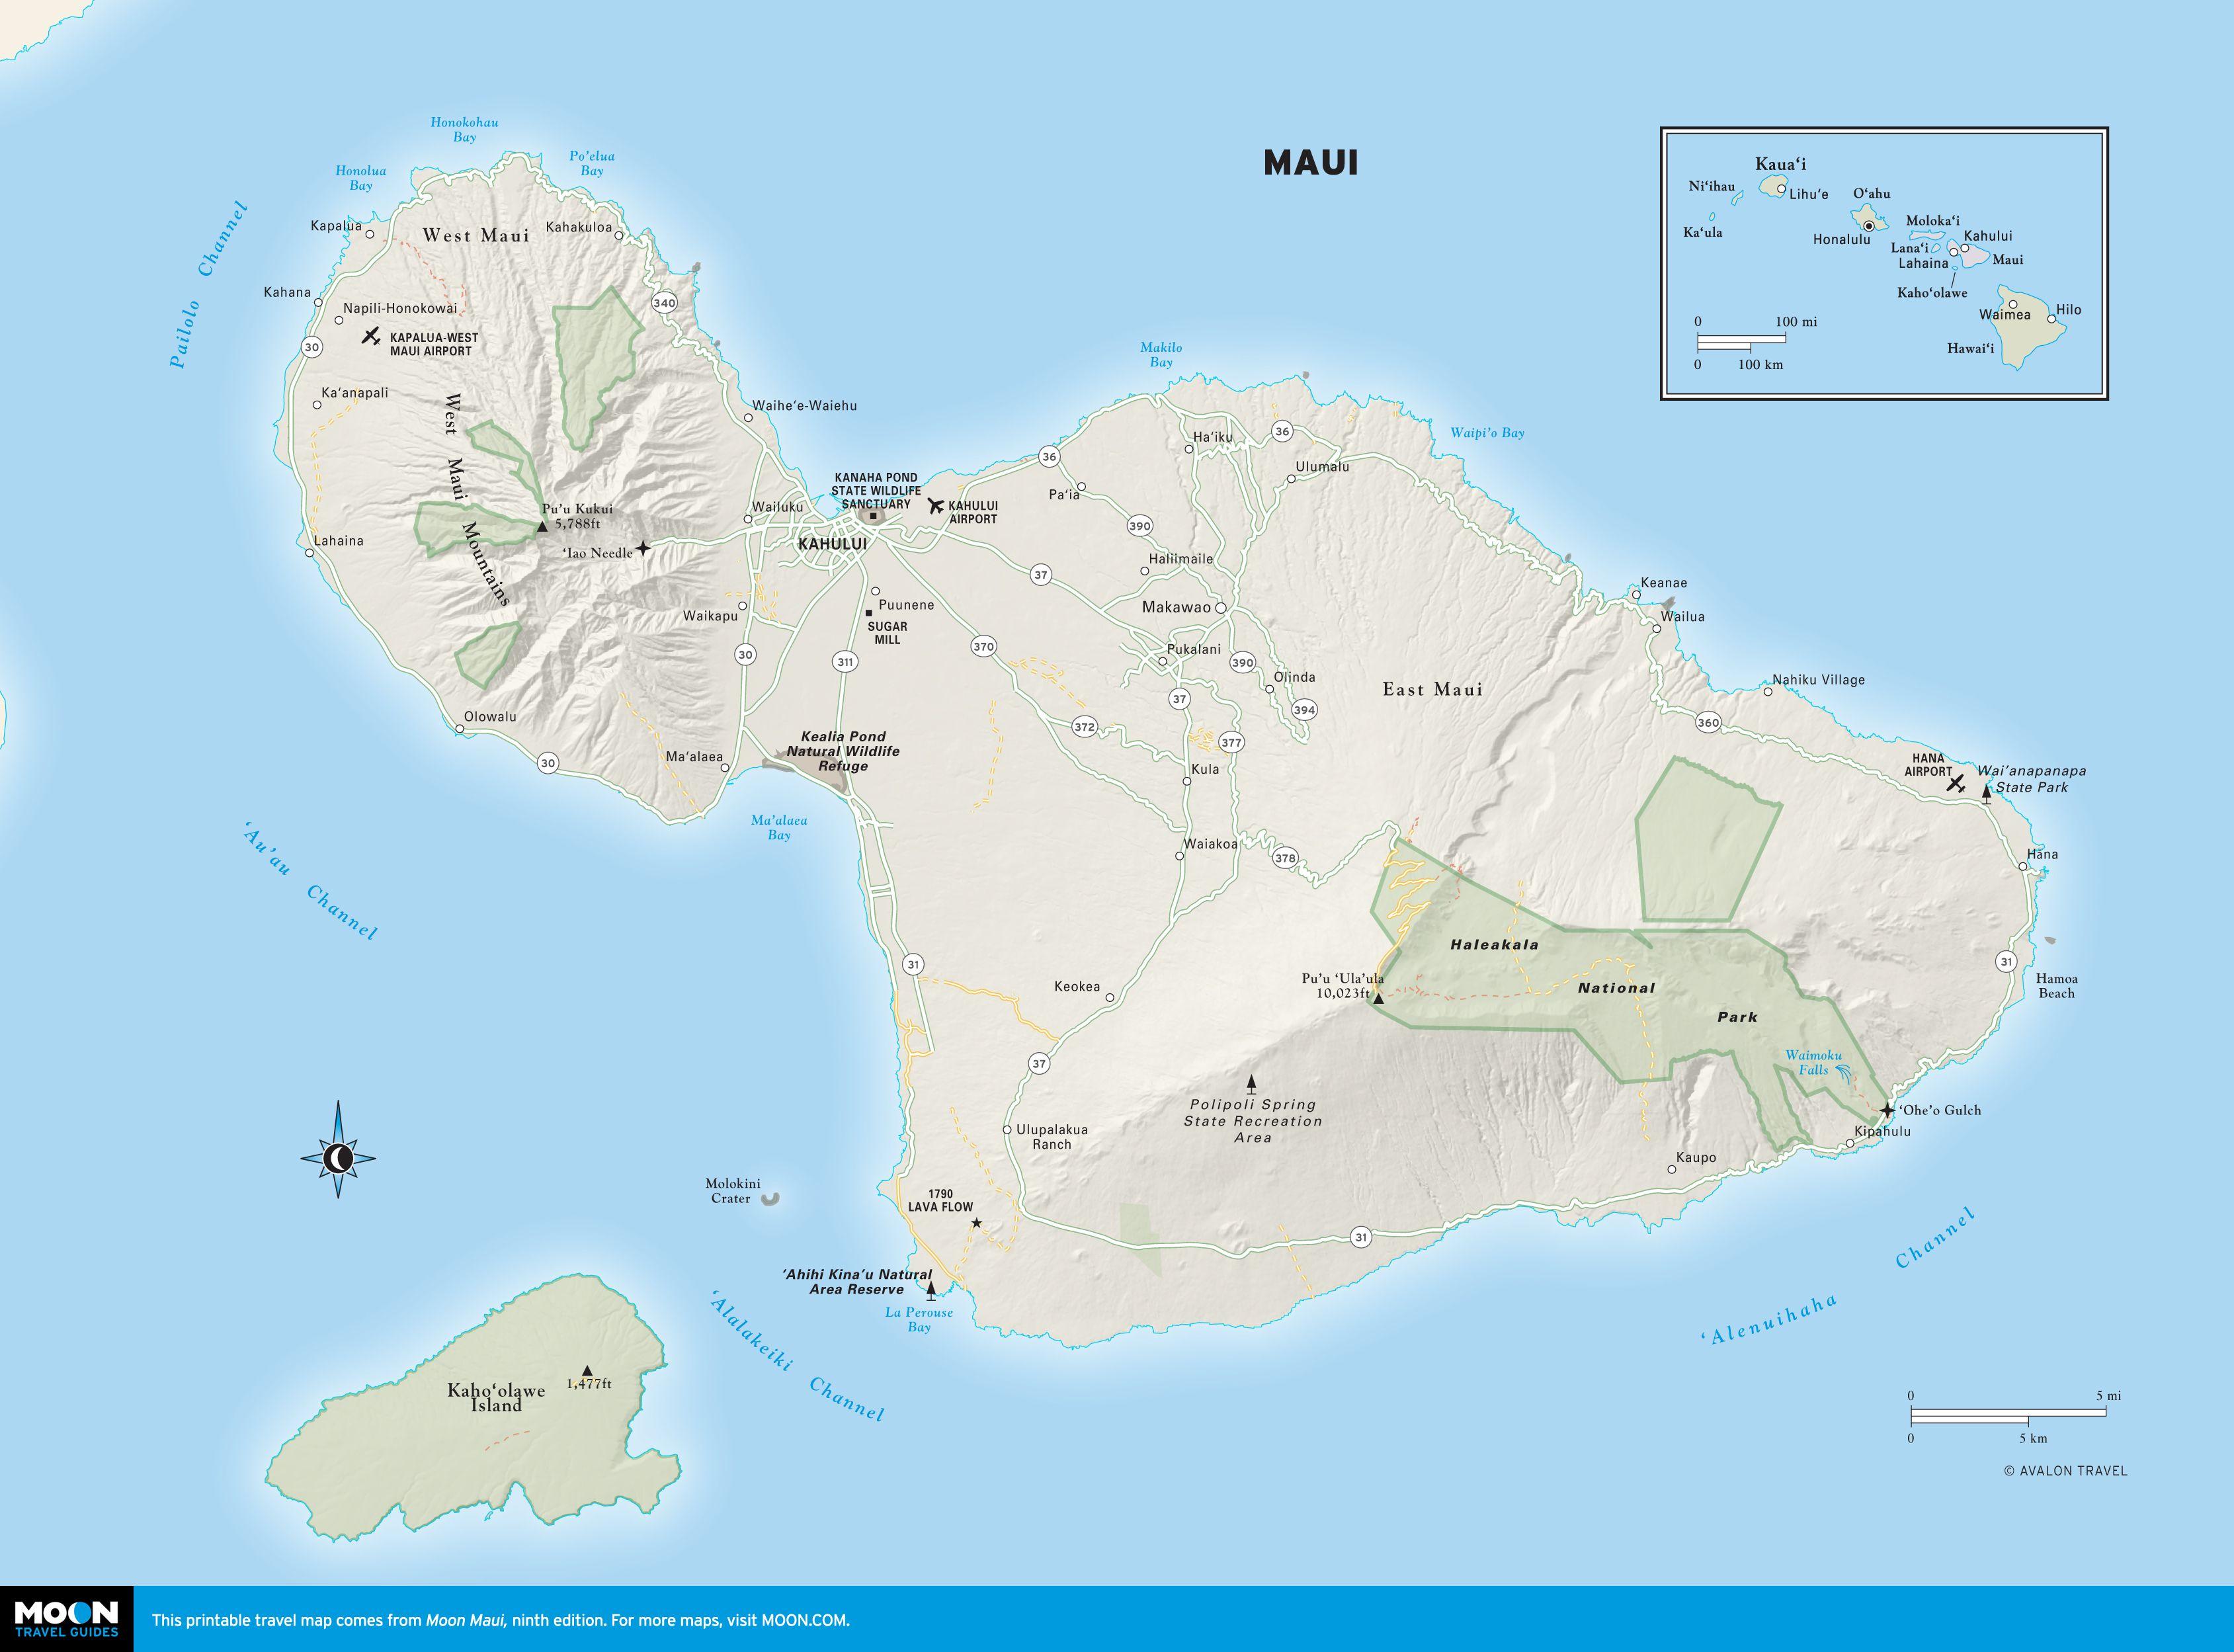 Printable travel maps of maui pinterest maui hawaii and hawaii color map of maui hawaii thecheapjerseys Choice Image